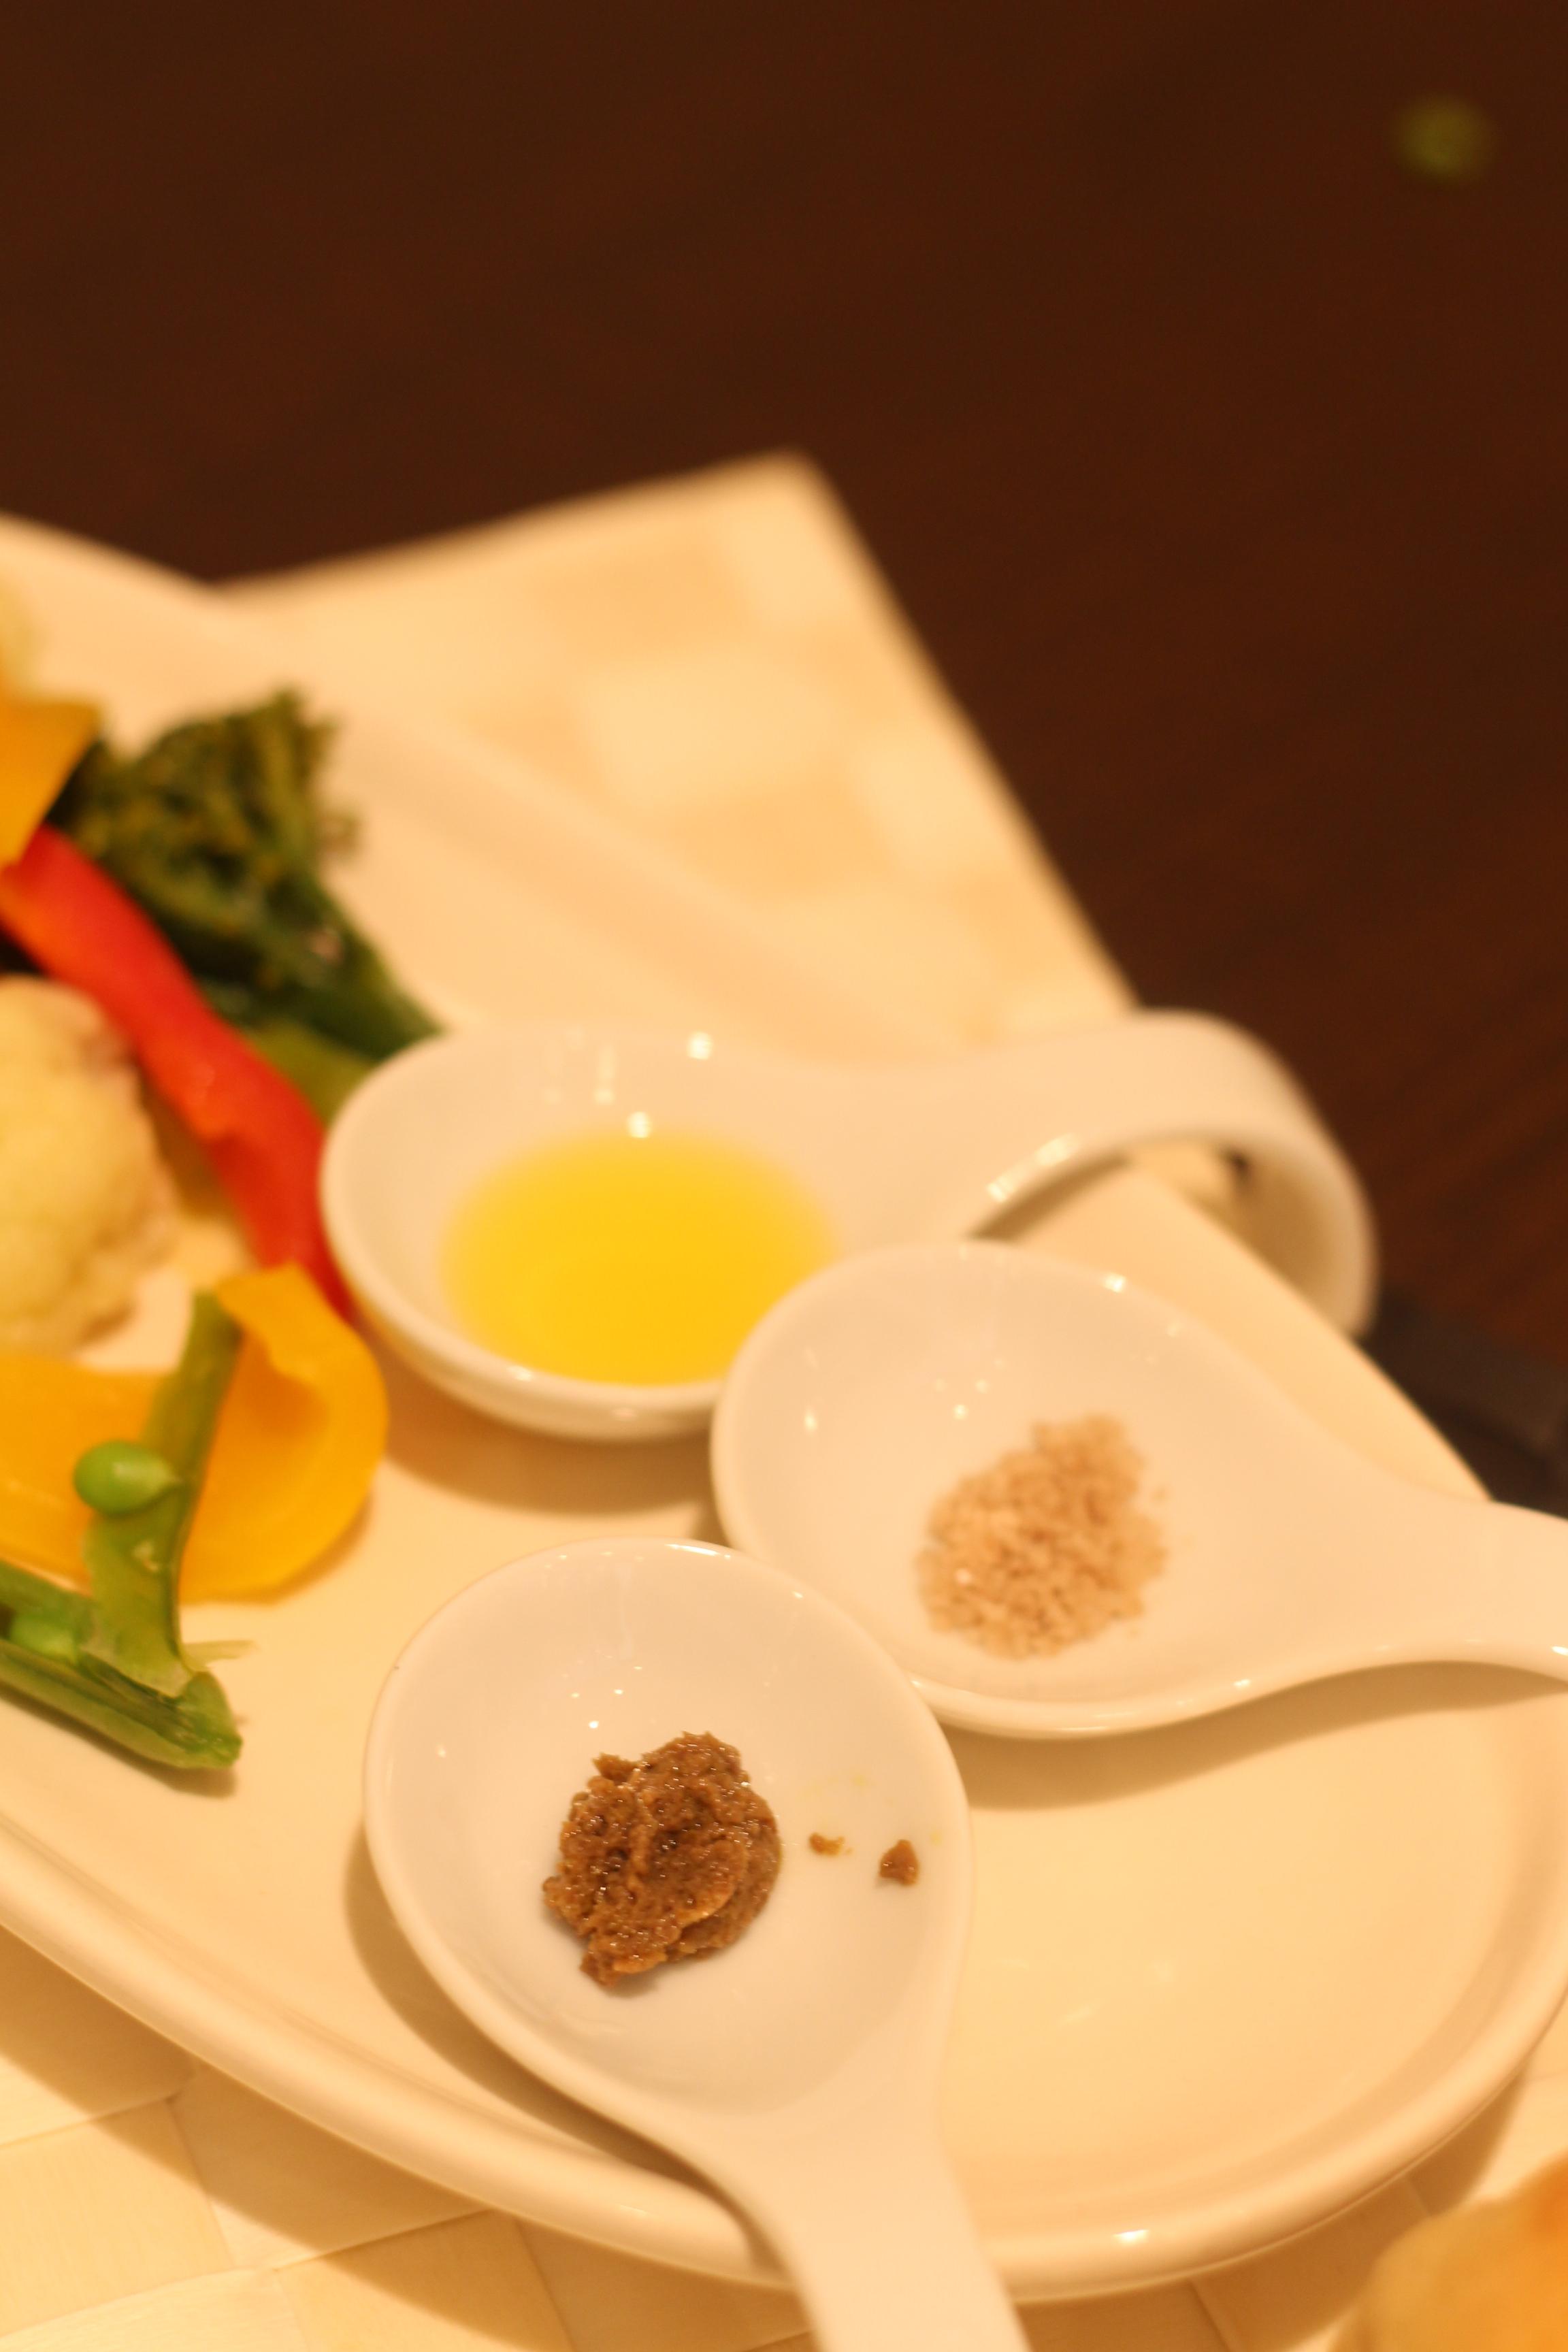 a-ta-sante糖質制限パン料理教室。京都江部粉糖質制限プチパン・バタートップブレッド・トルティーヤ。クリナップ神戸。